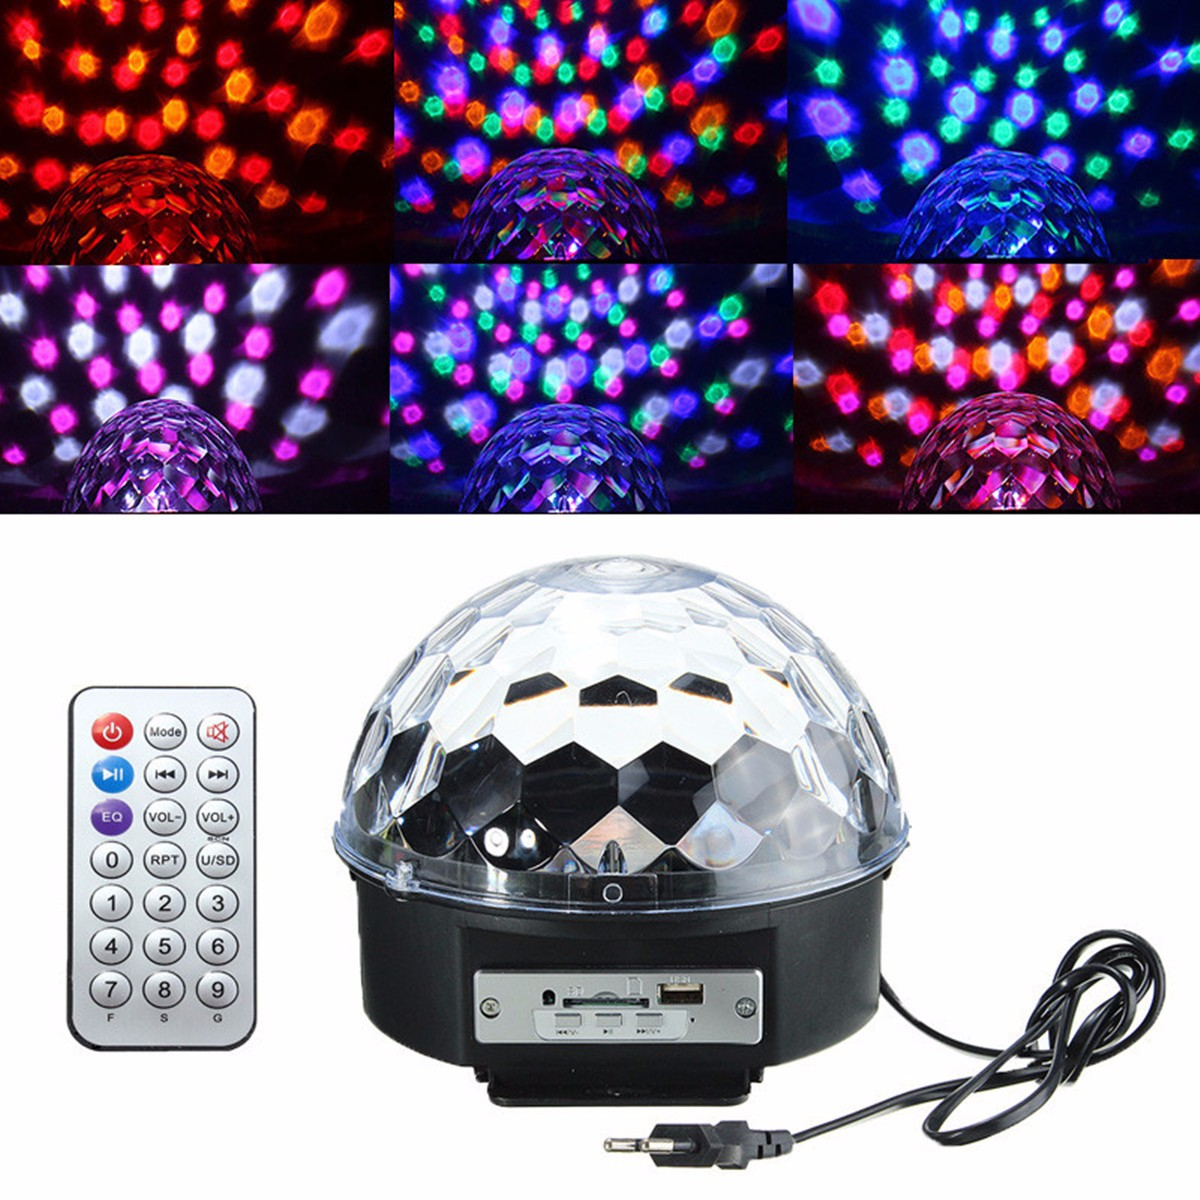 Jiguoor Digital LED RGB Crystal Magic Ball Effect Light for Christmas Halloween Stage Party Disco DJ Bar Lighting AC110V-240V 2016 new high quality digital effects lights stage lighting digital displays led magic balls hot